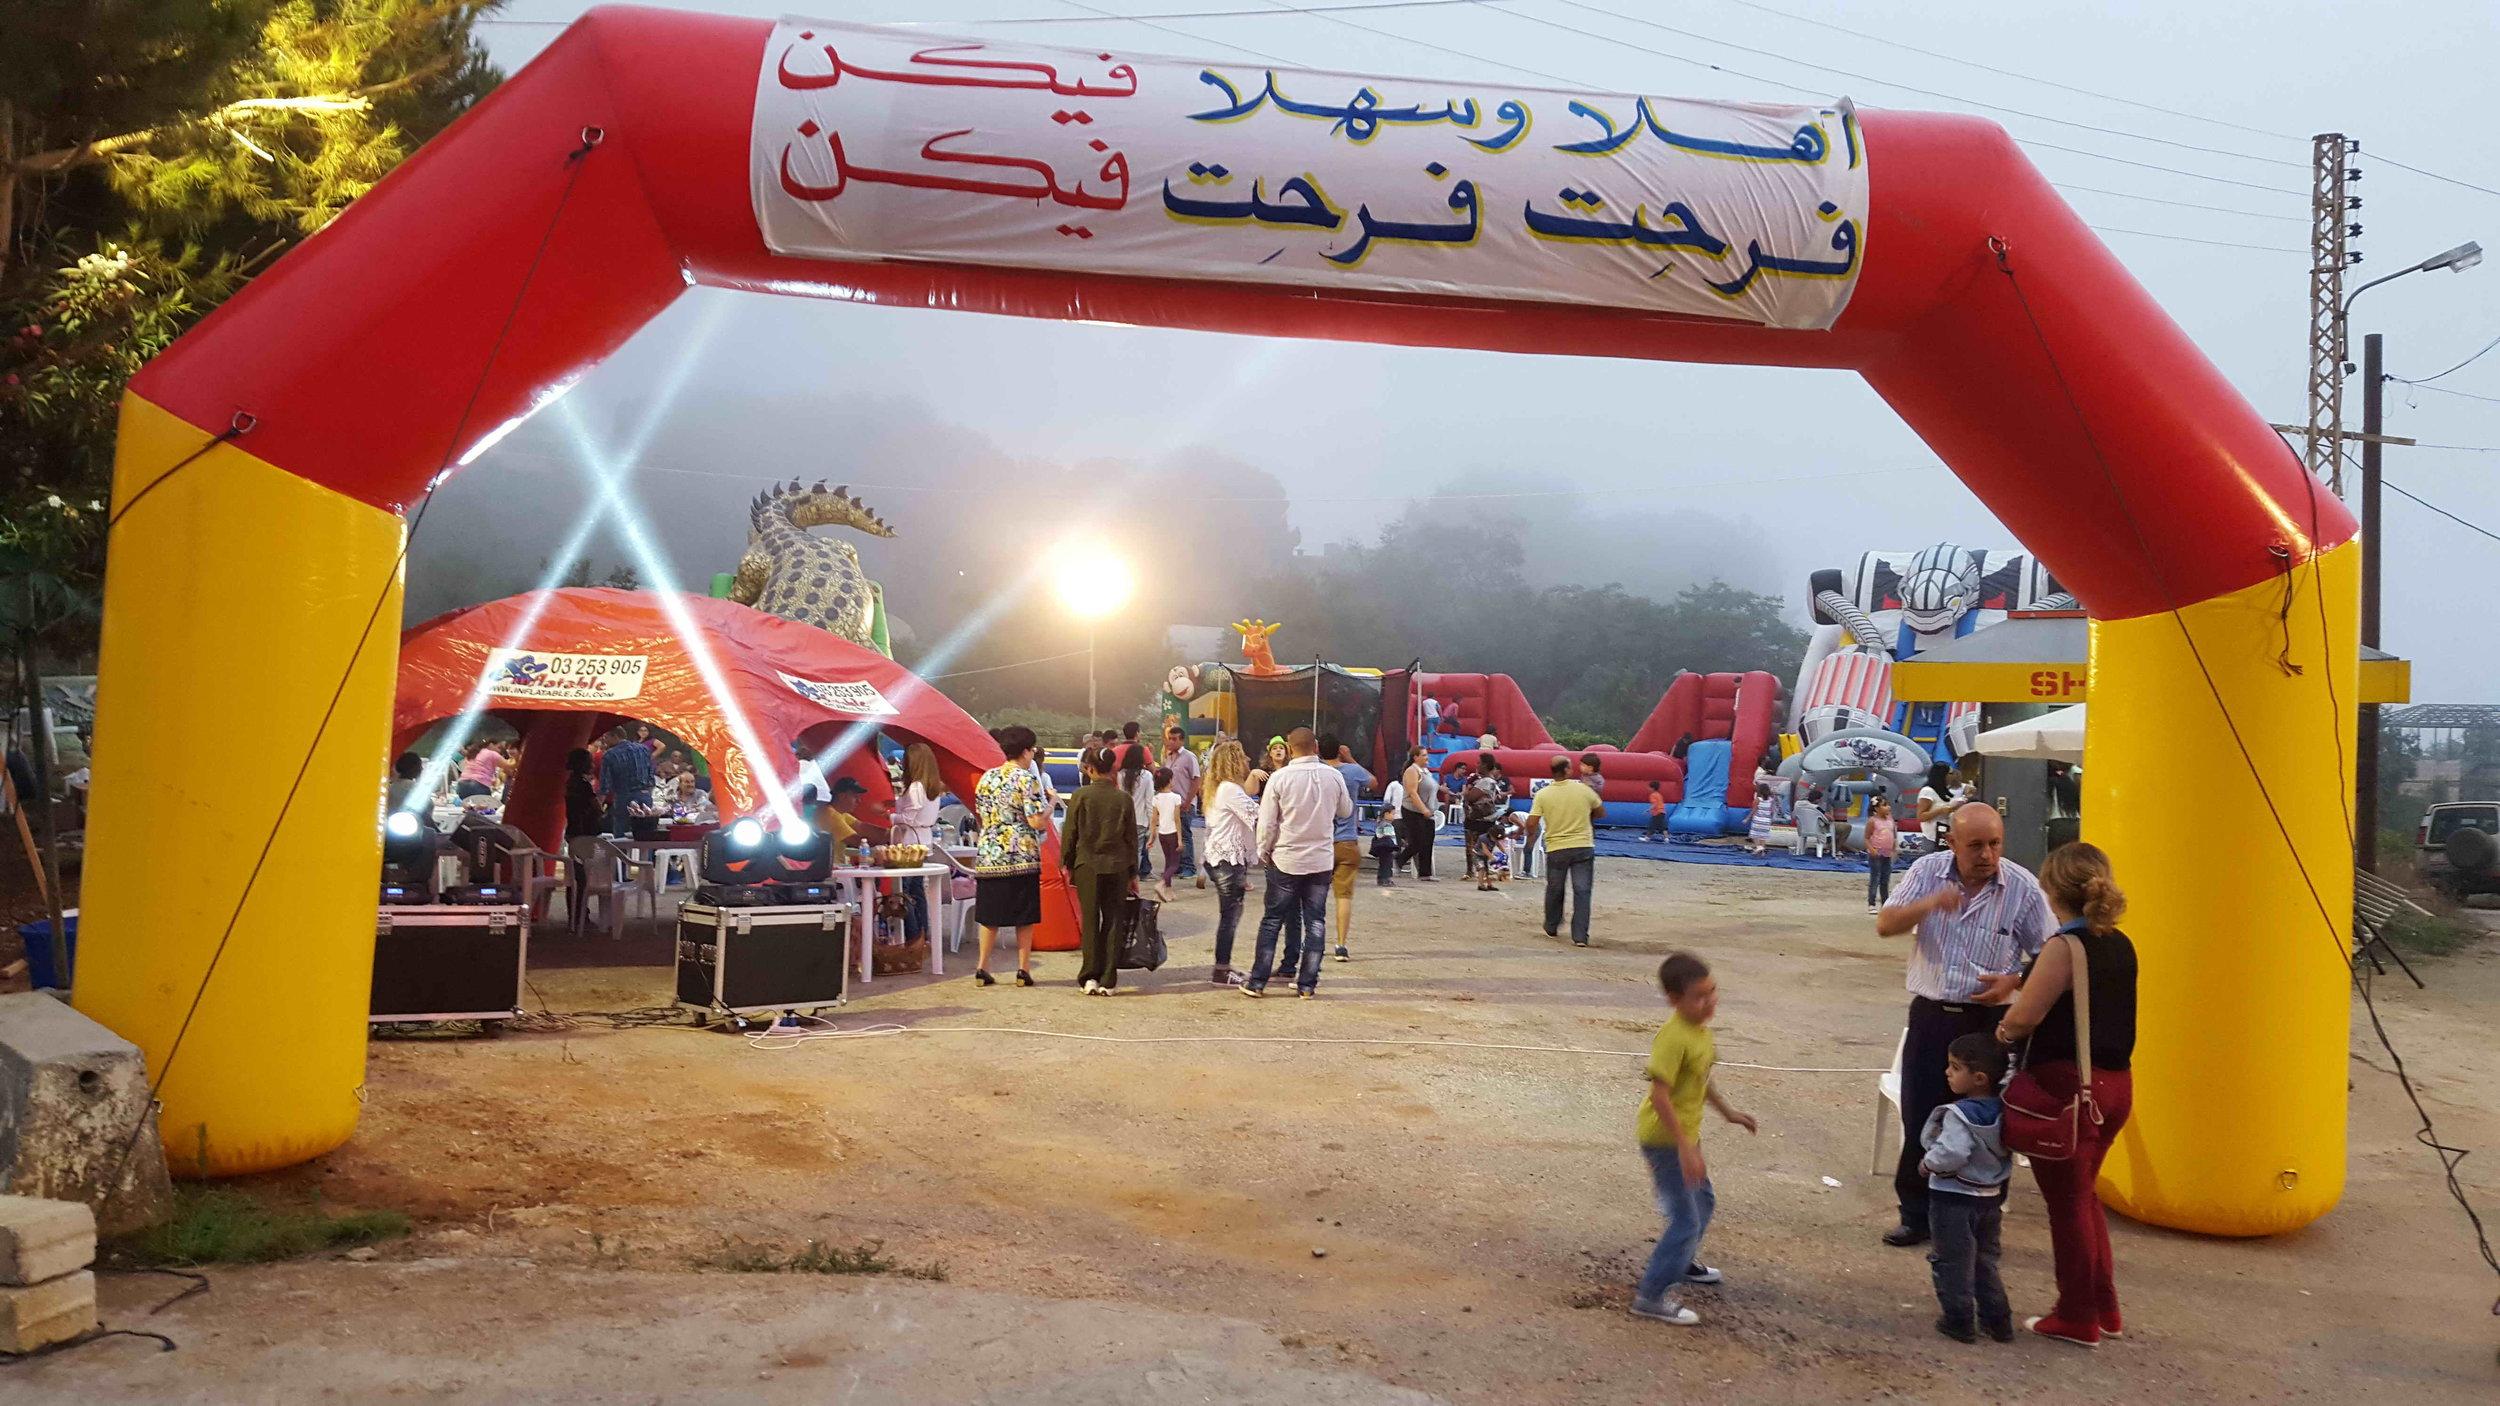 Entrance Arch for Marathon and Festival